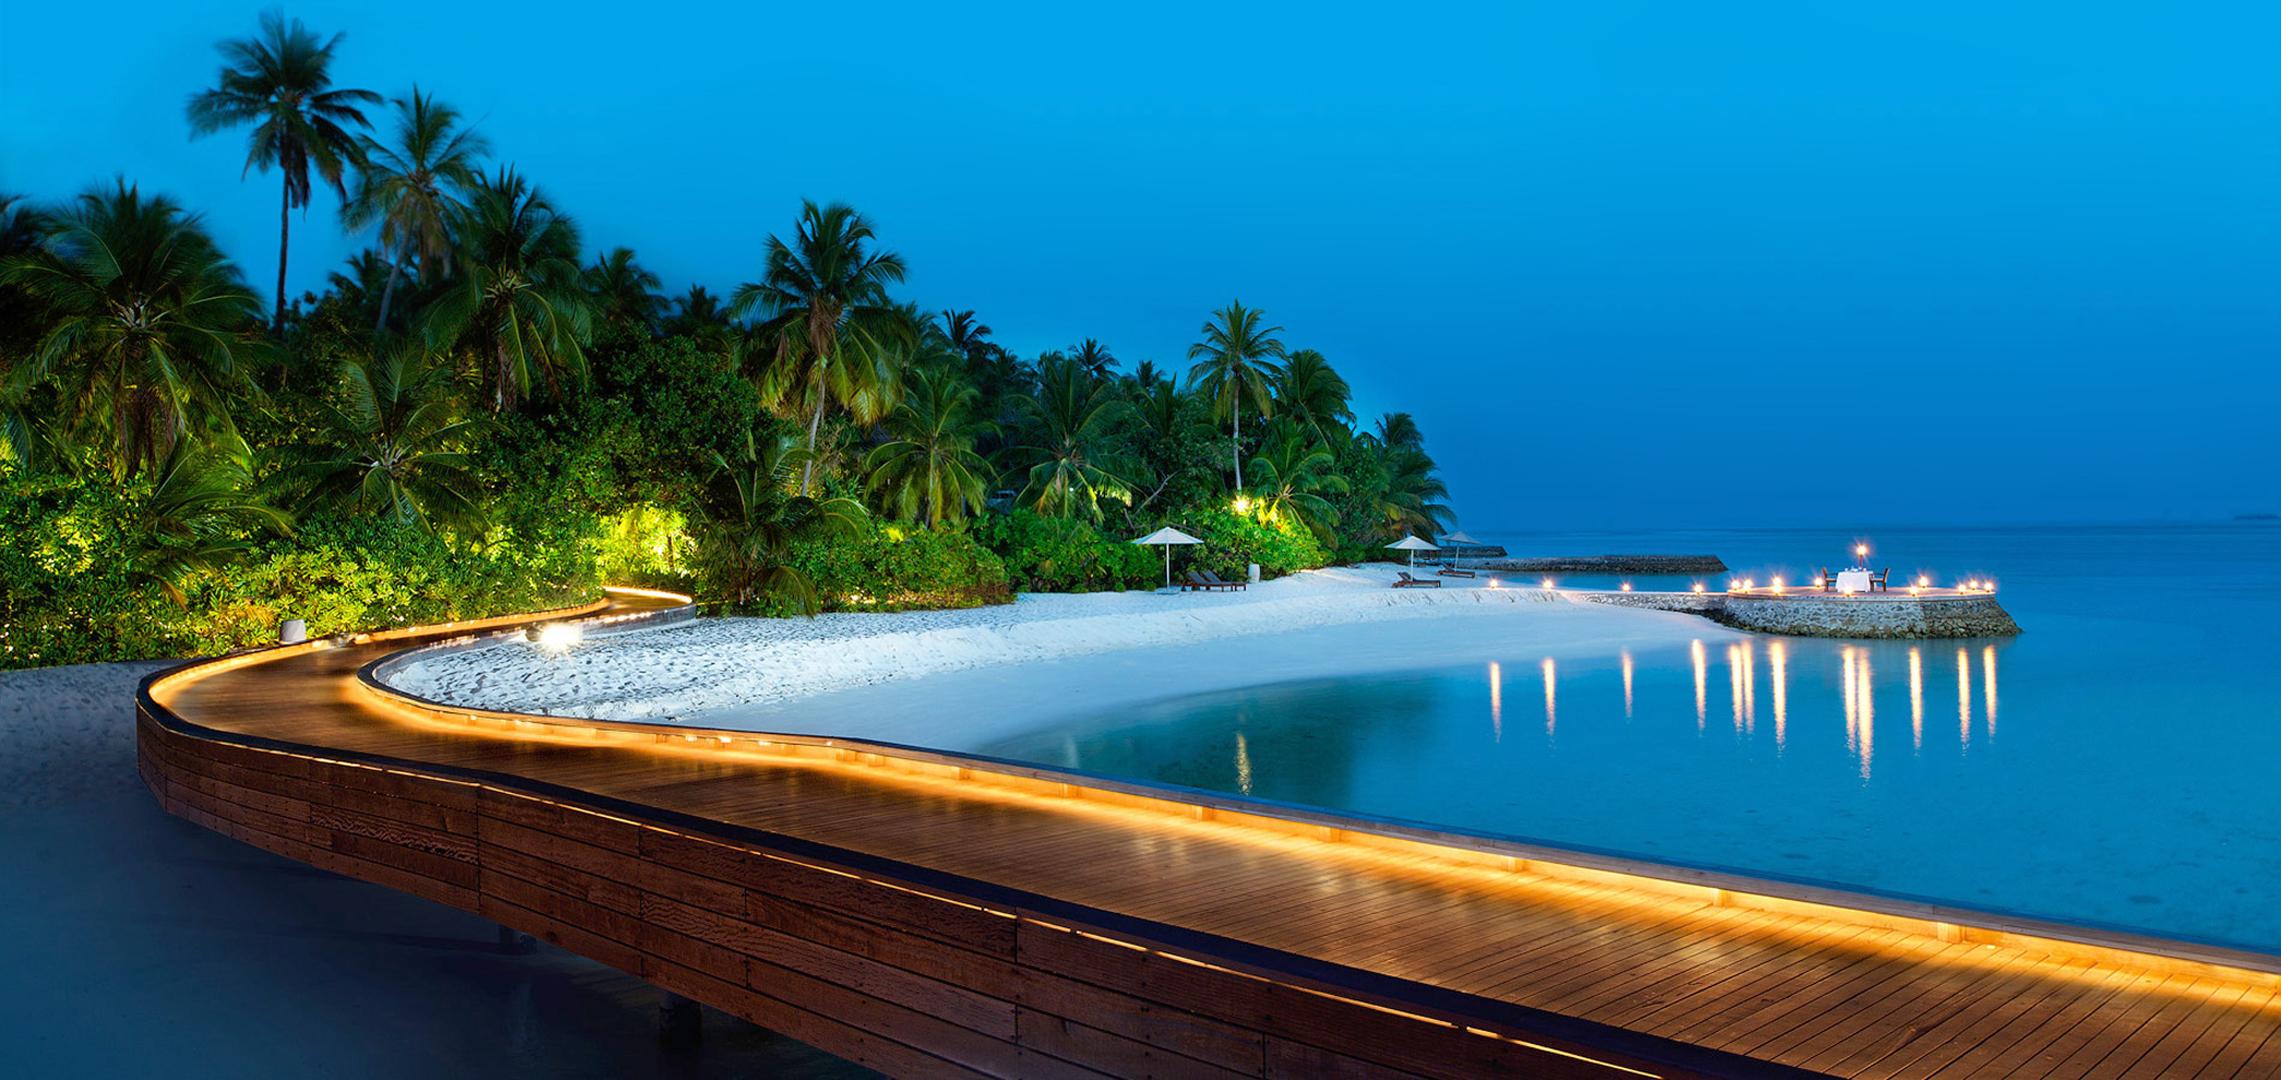 Free Photo Tropics Sea Beach To Desktop